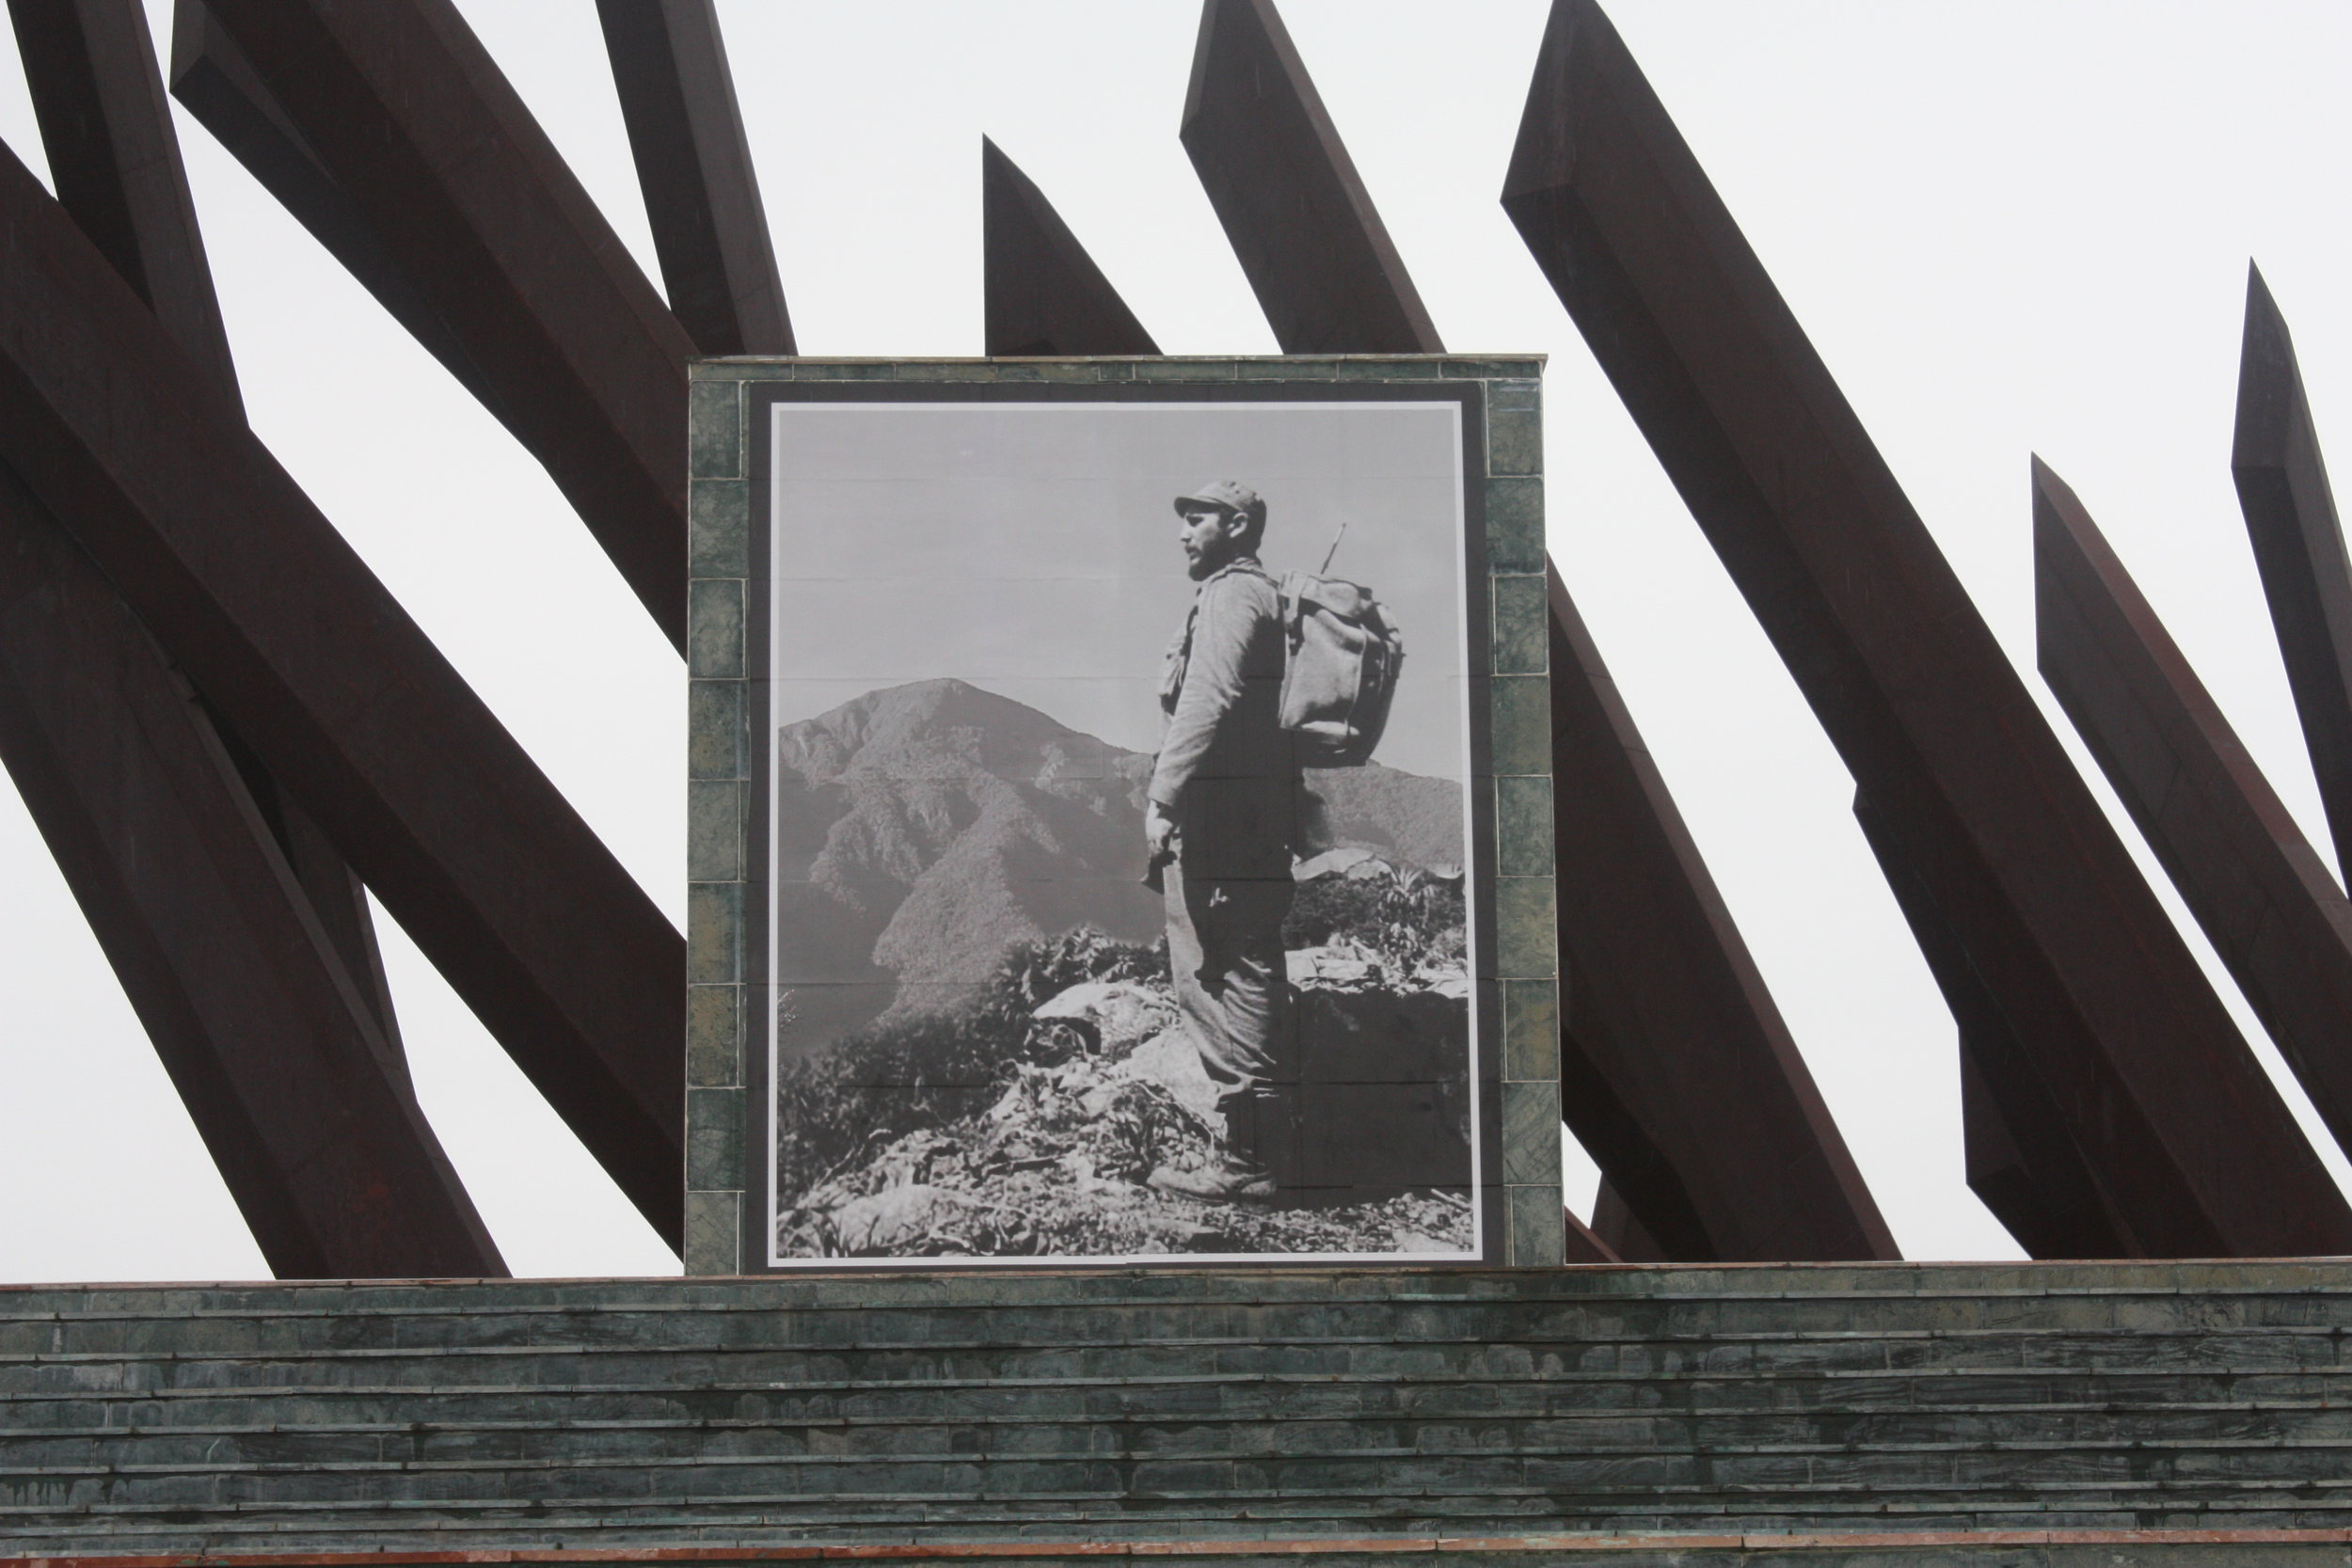 Antonio Maceo Revolution Square, Cuba